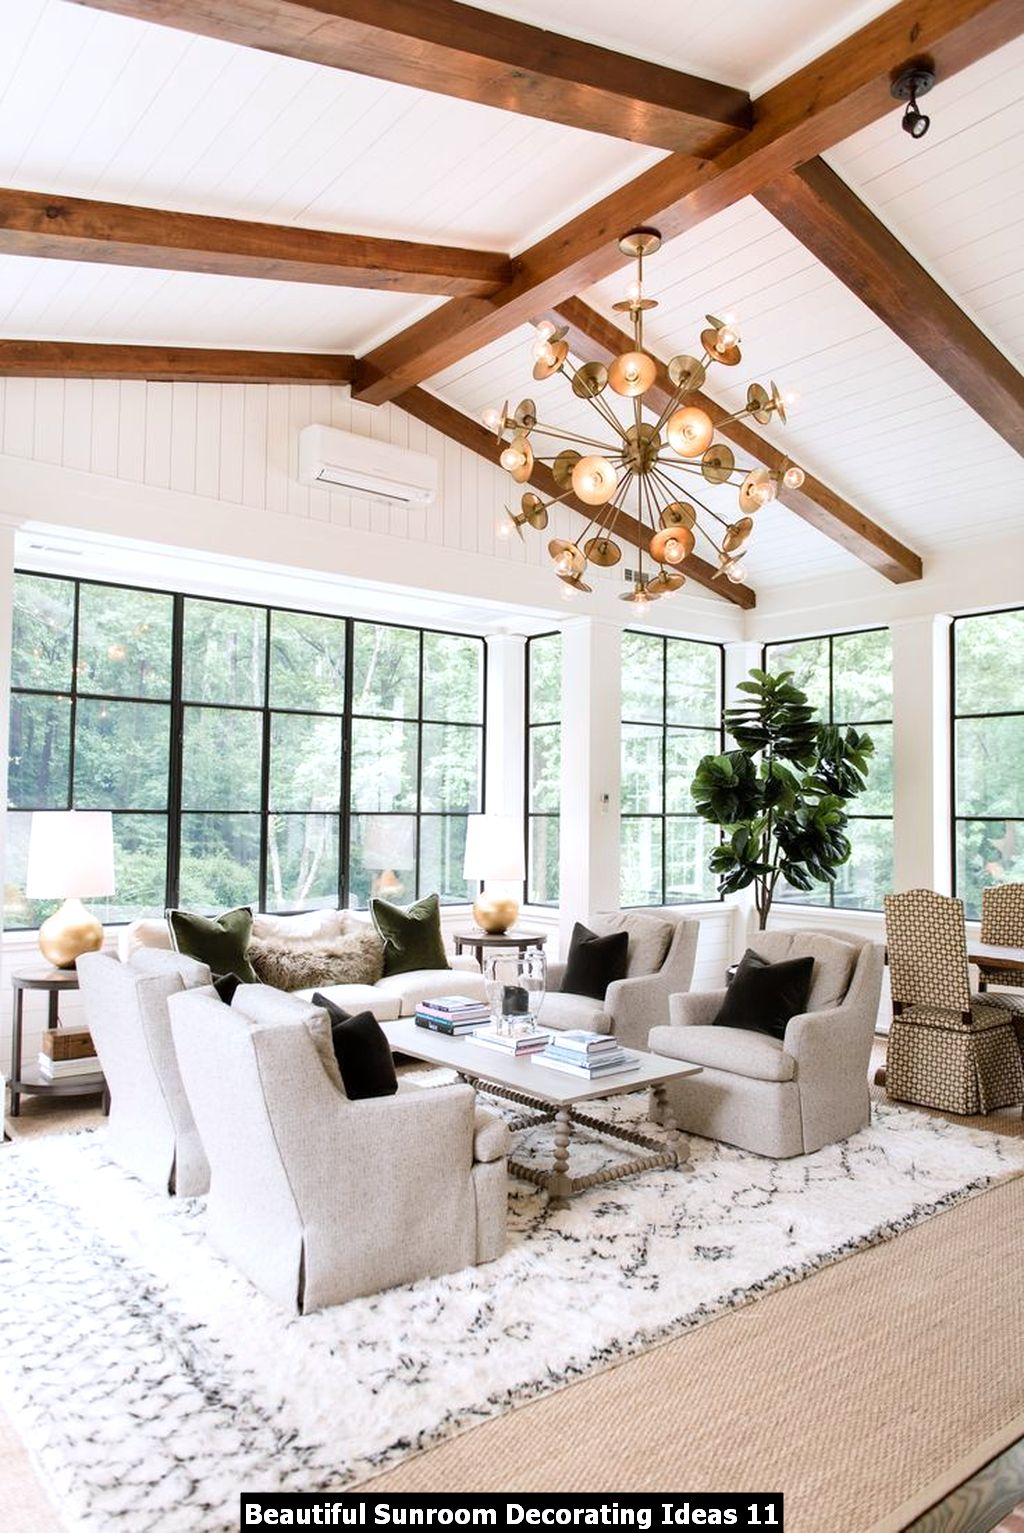 Beautiful Sunroom Decorating Ideas 11